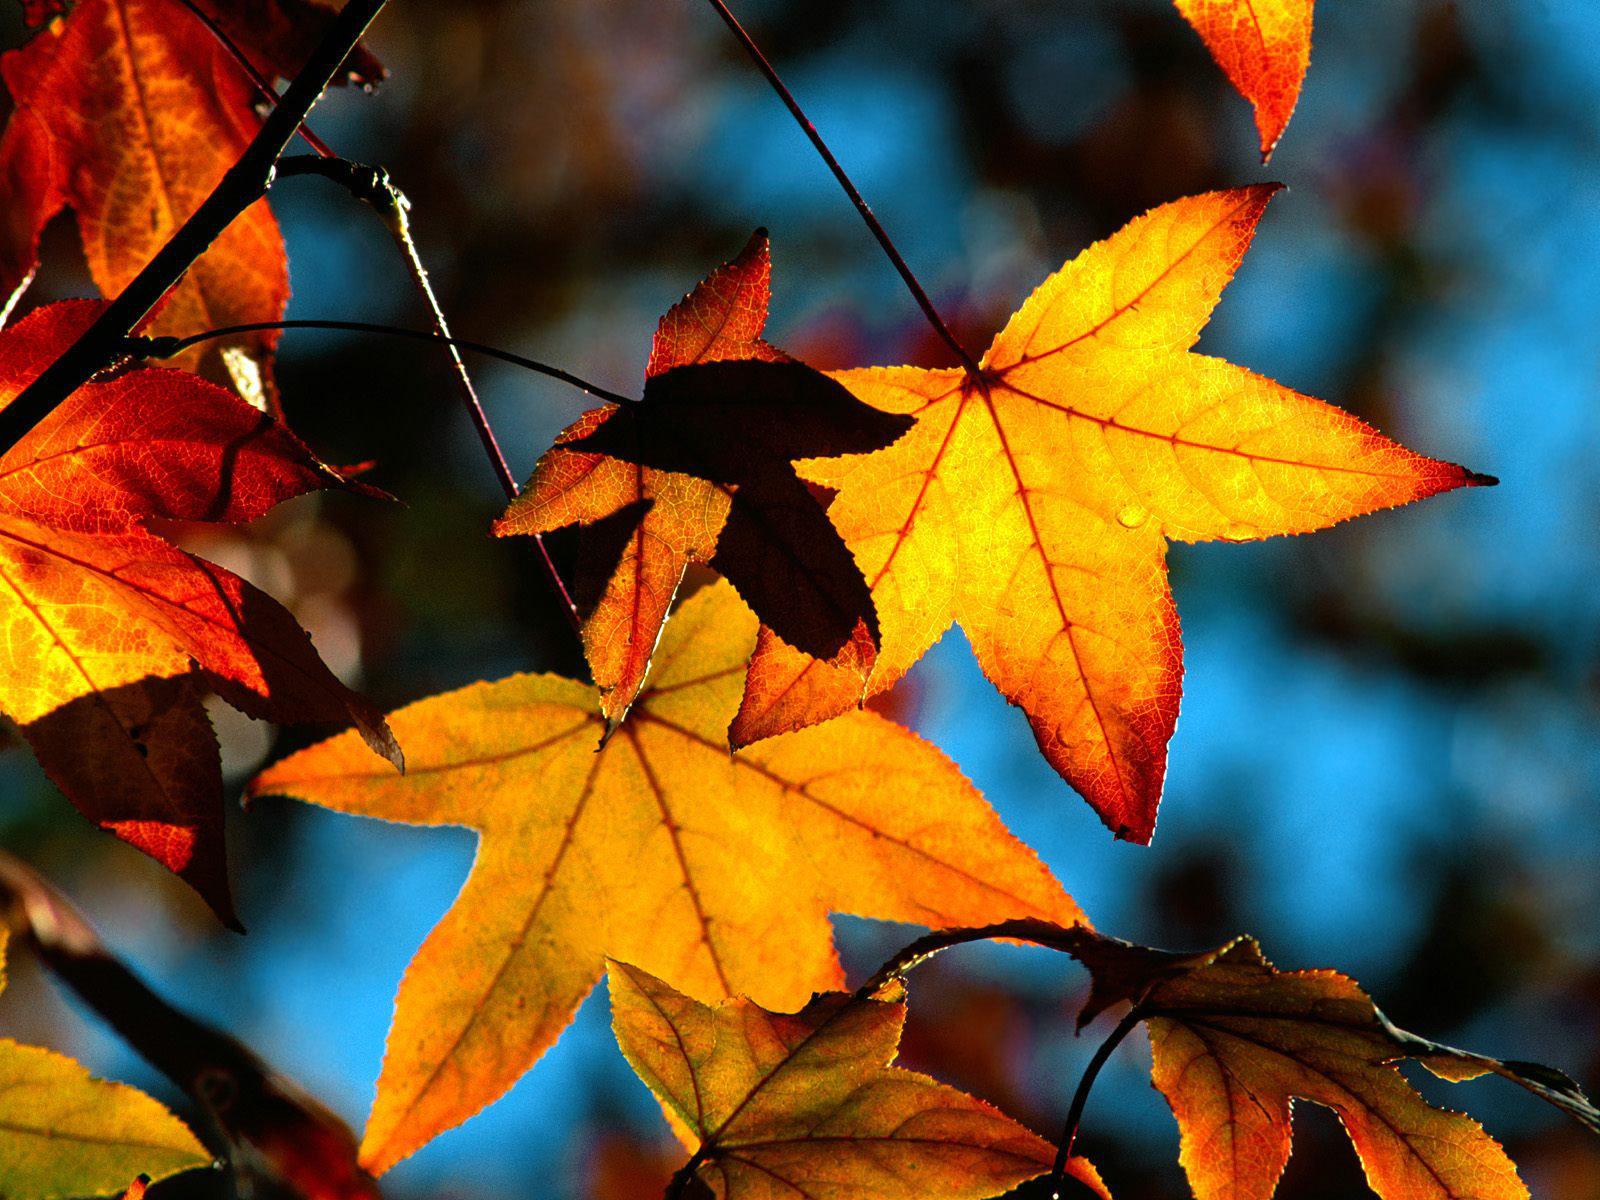 The best top autumn desktop wallpapers 8 En Güzel Sonbahar HD Duvar Kağıtları